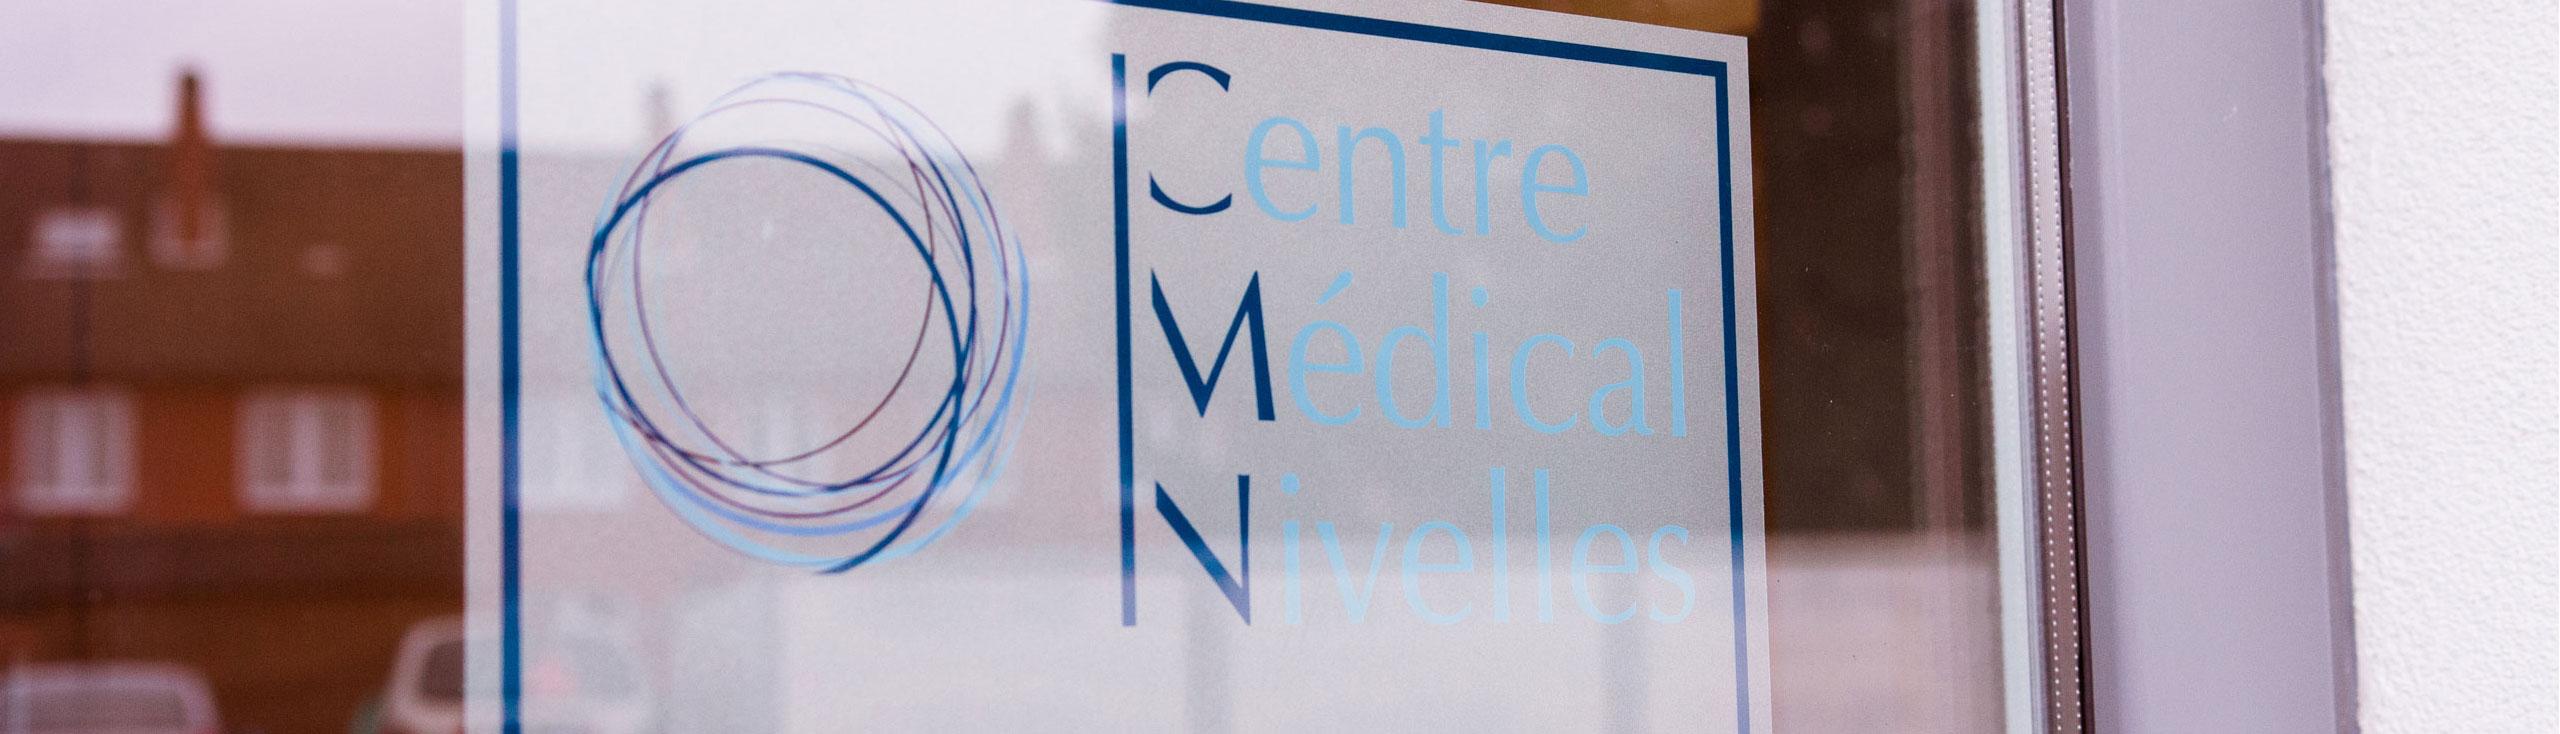 Logo - Centre Médical Nivelles